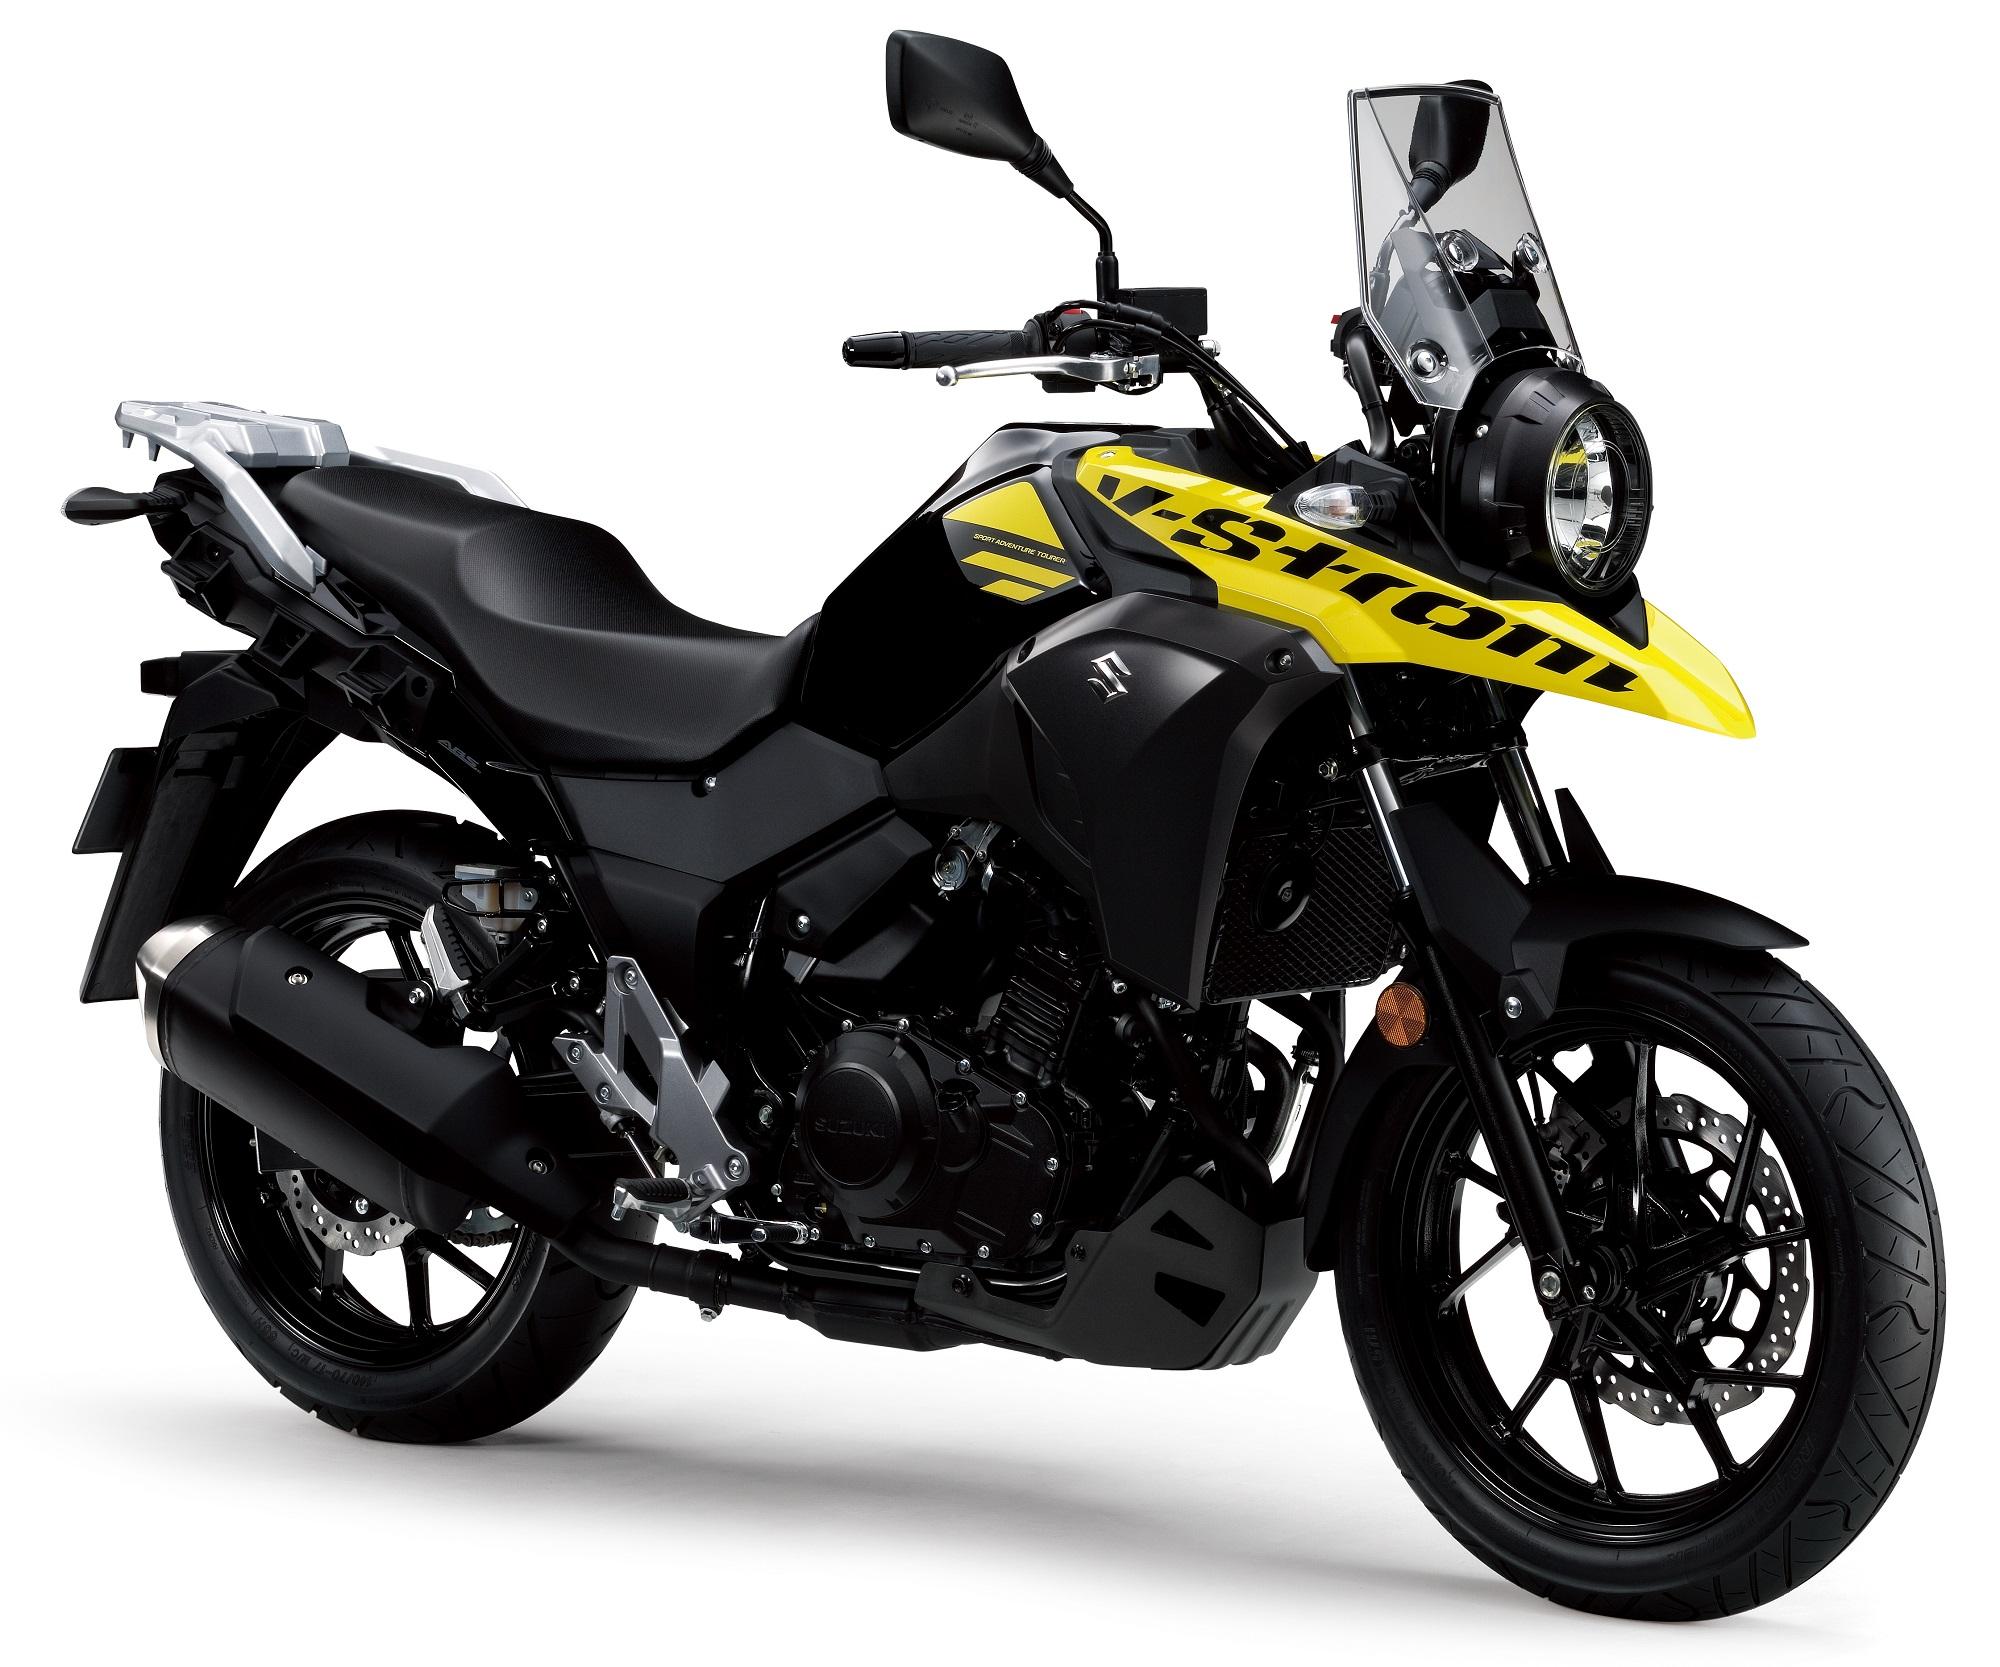 Suzuki V Strom 250 Black Yellow New Suzuki Bikes